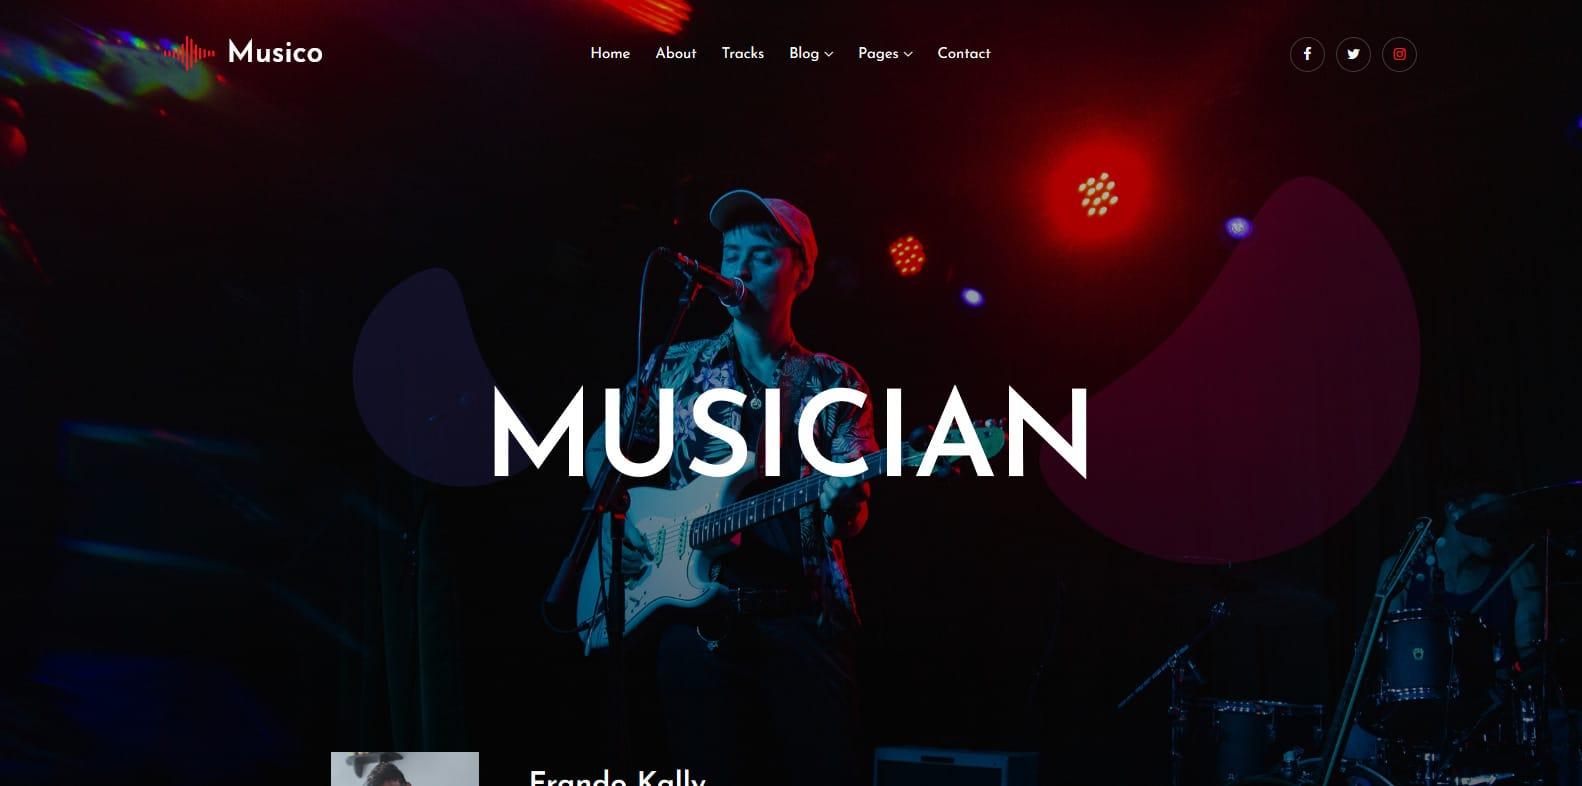 musico-music-website-template